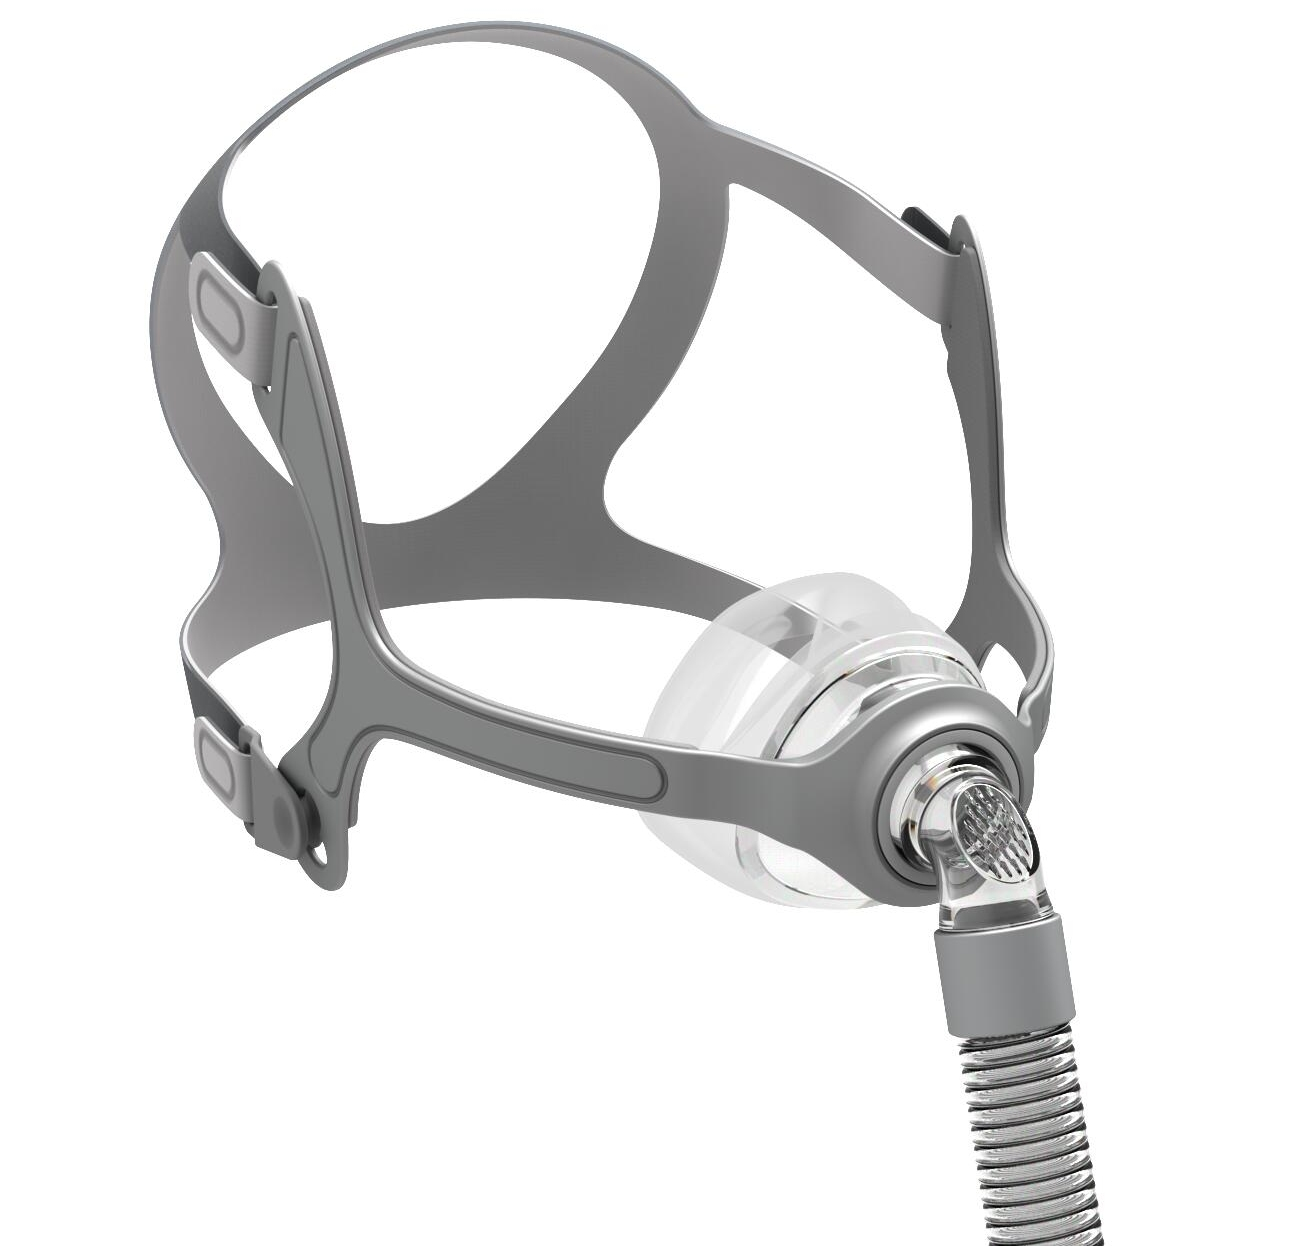 Silikonowa maska nosowa Adverti